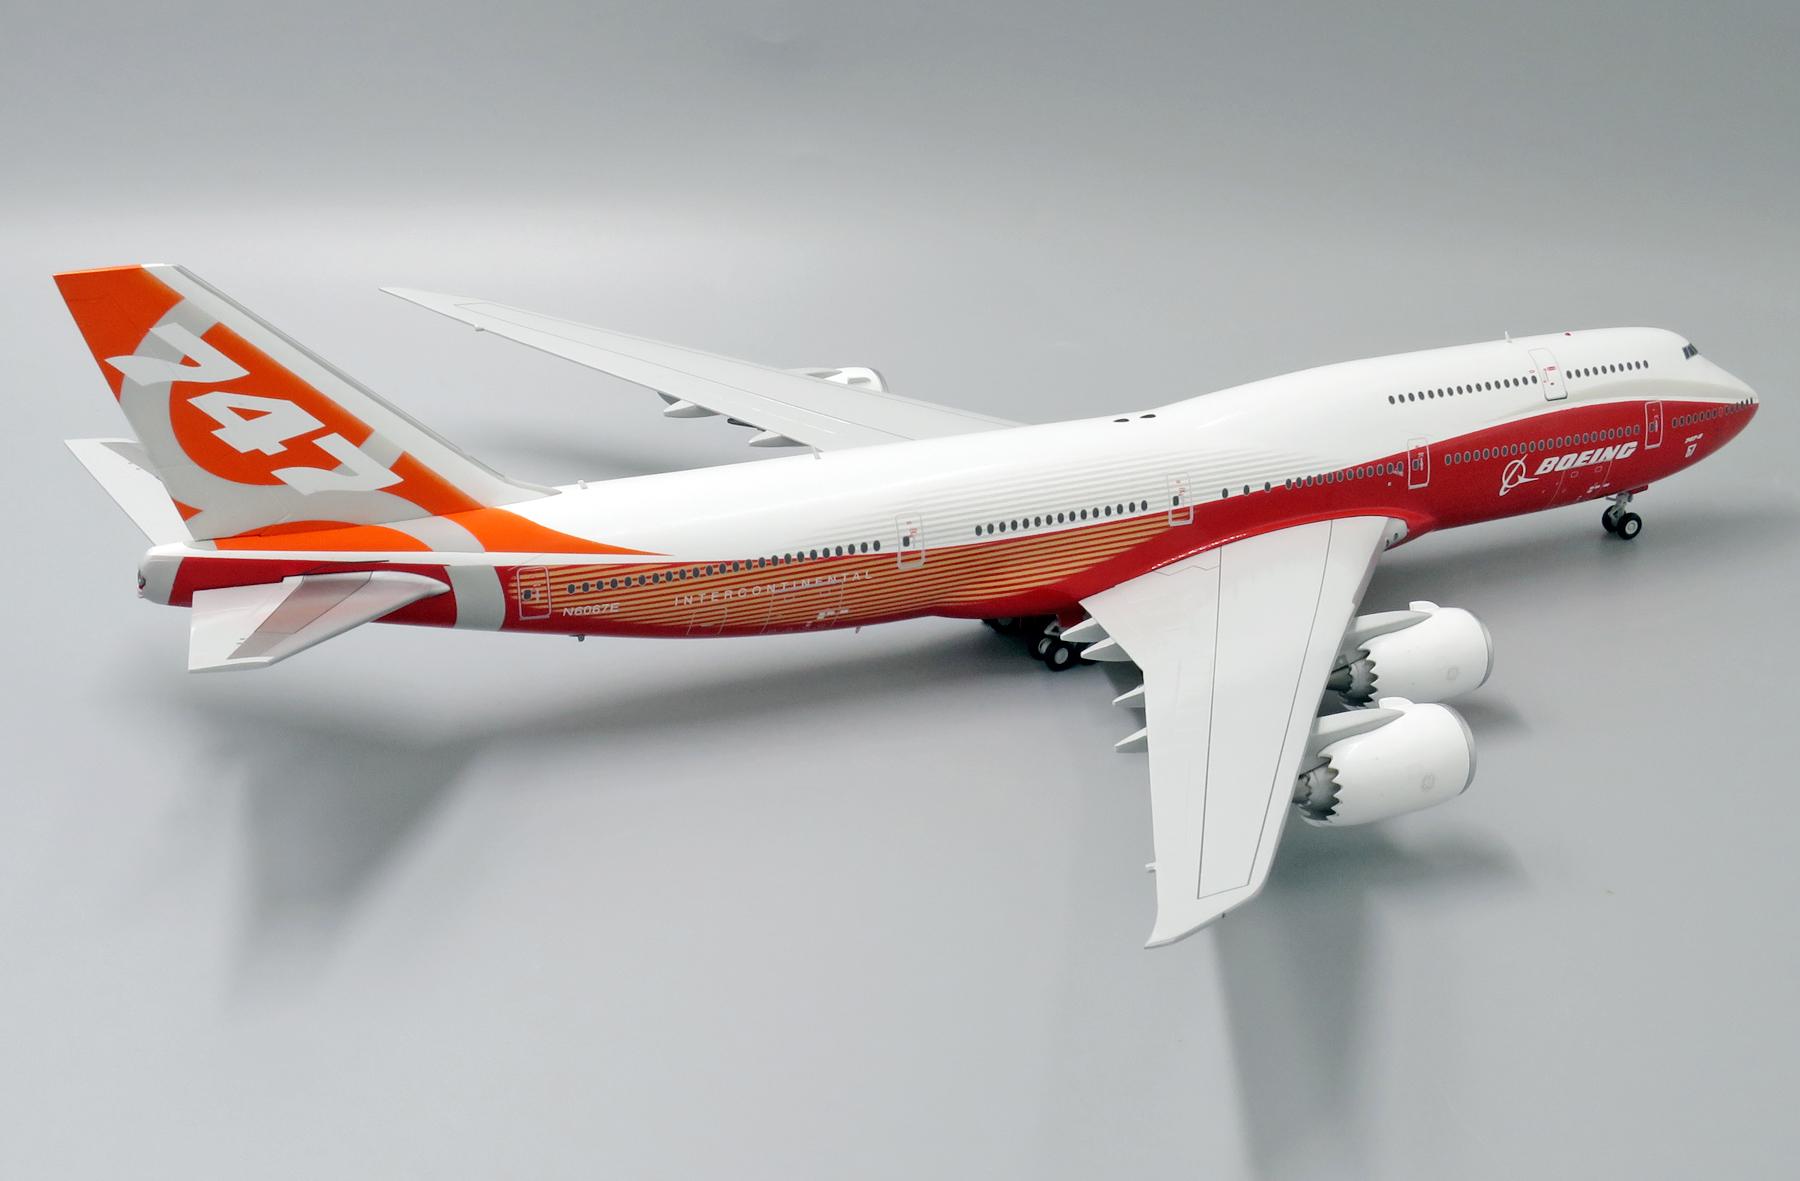 Scale Model Store.com :: JC Wings 1:200